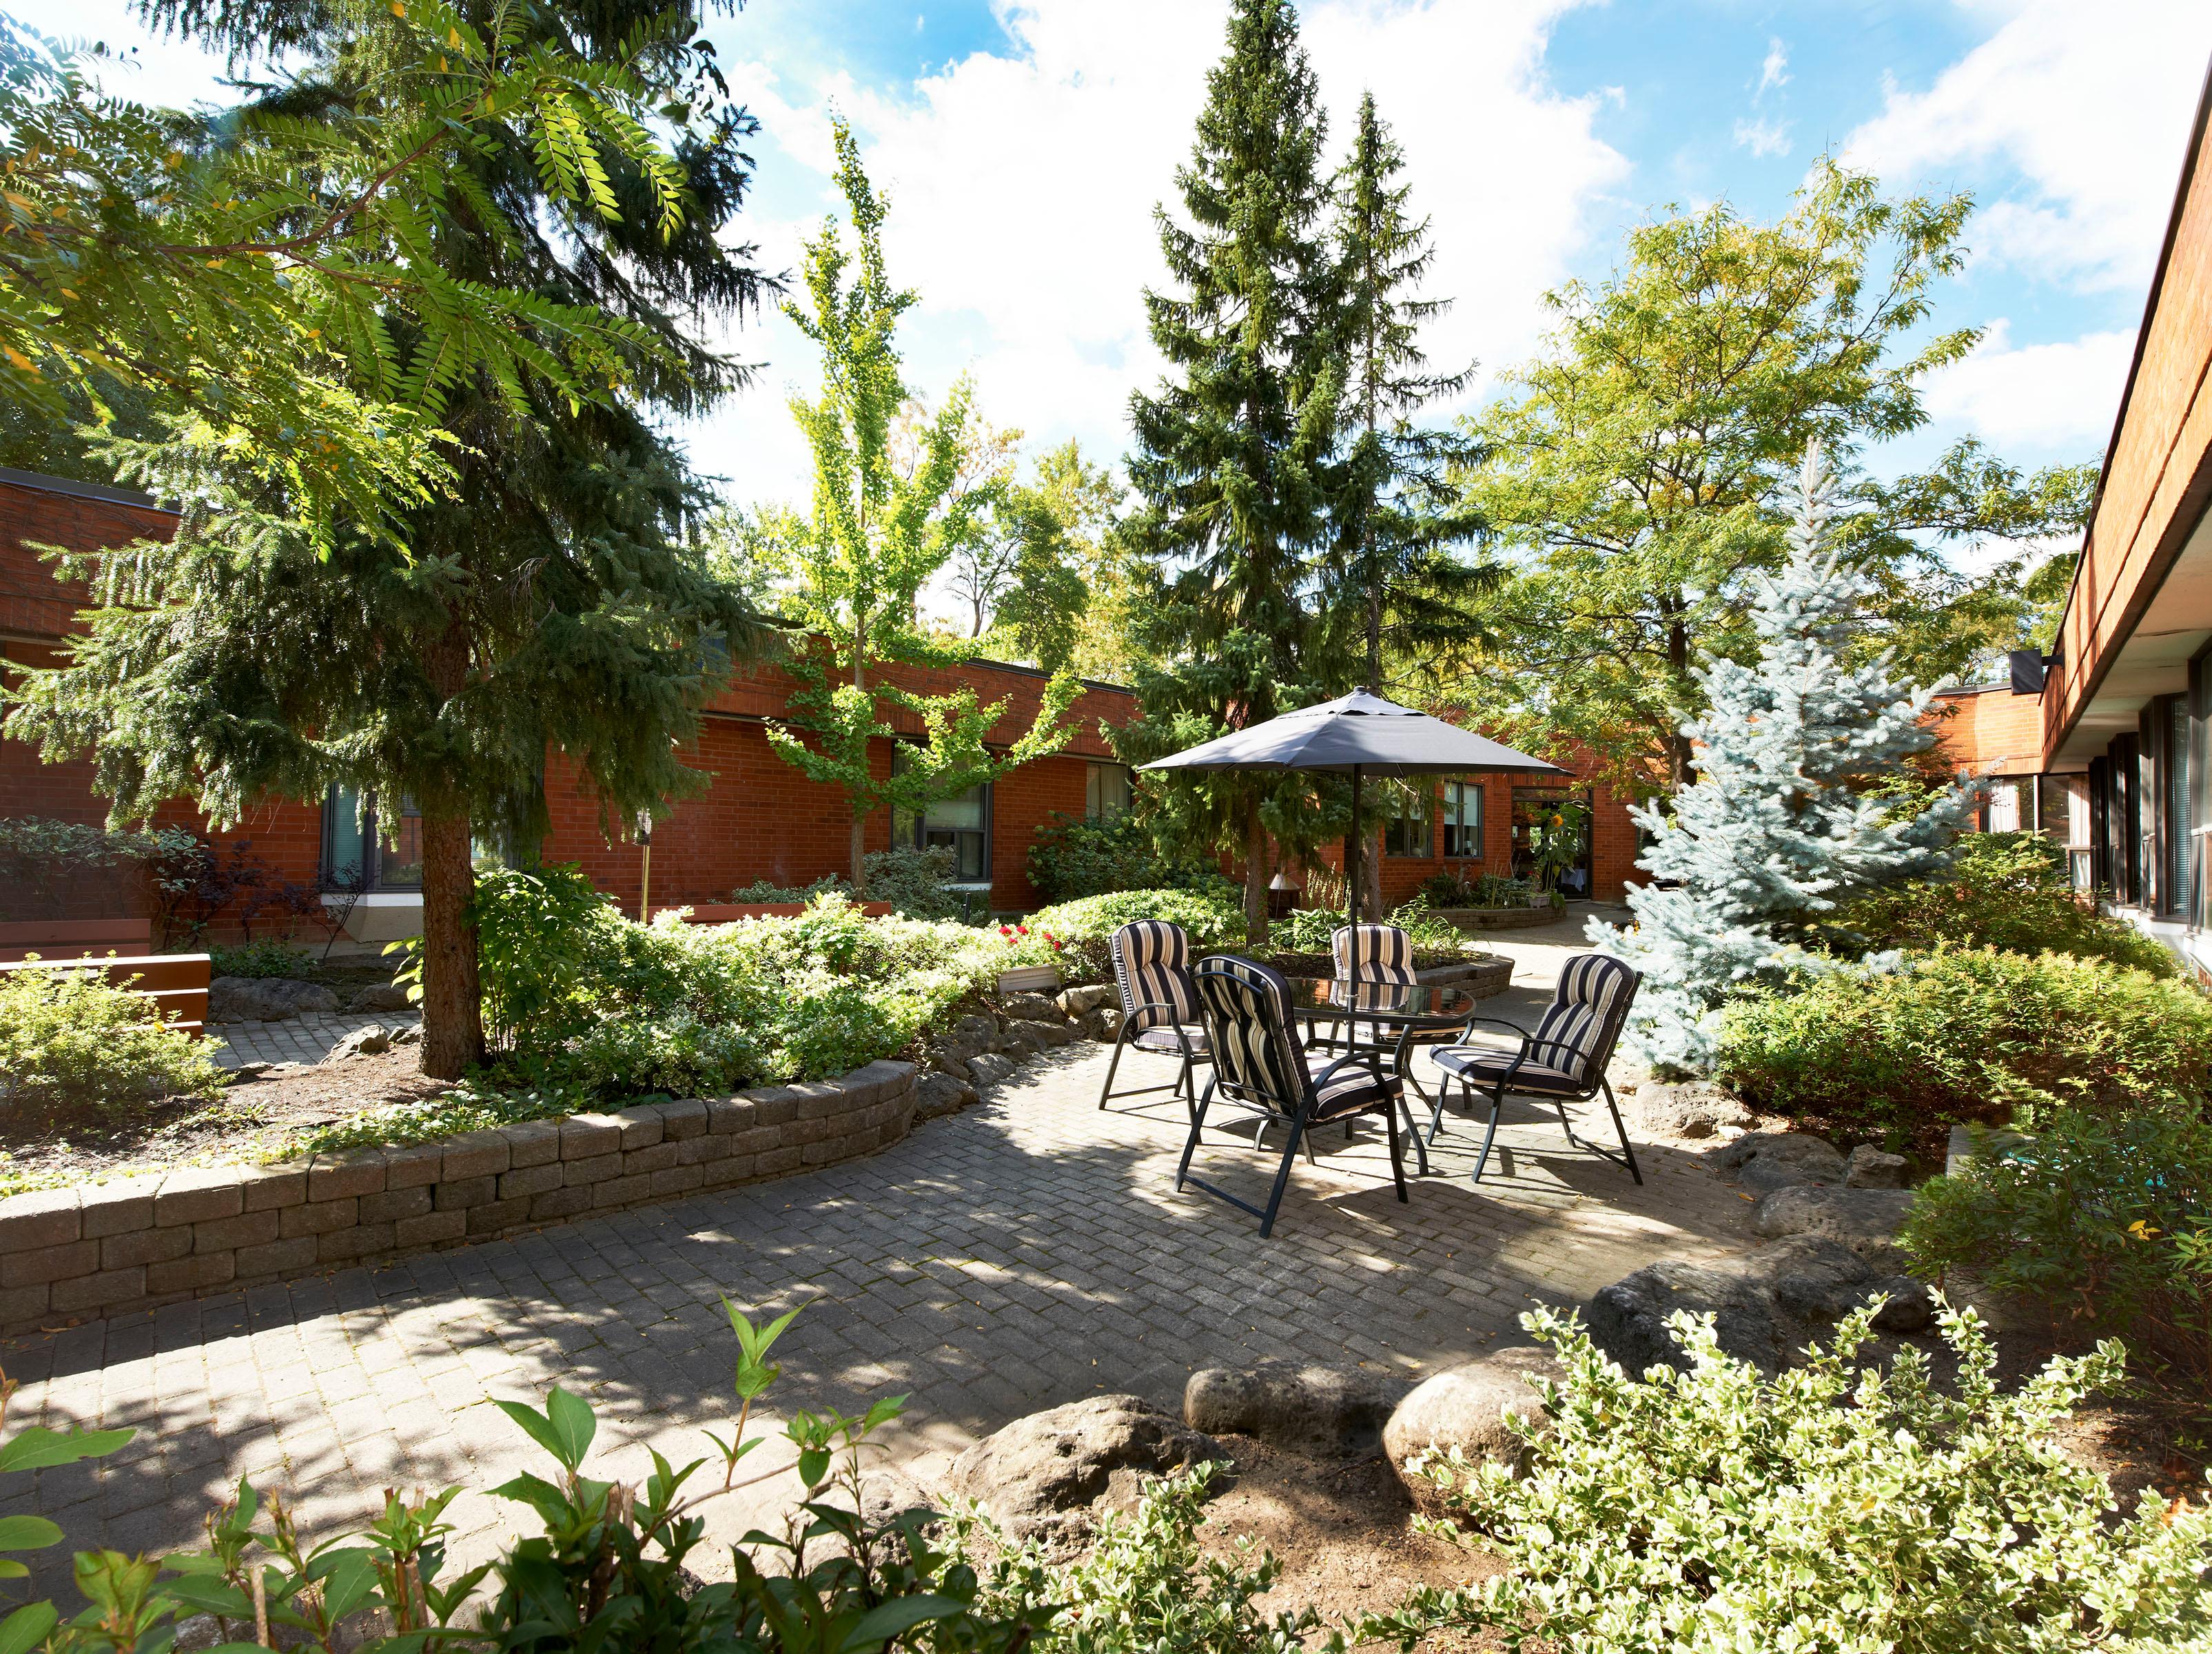 Revera Centennial Park Place Etobicoke (416)621-2139